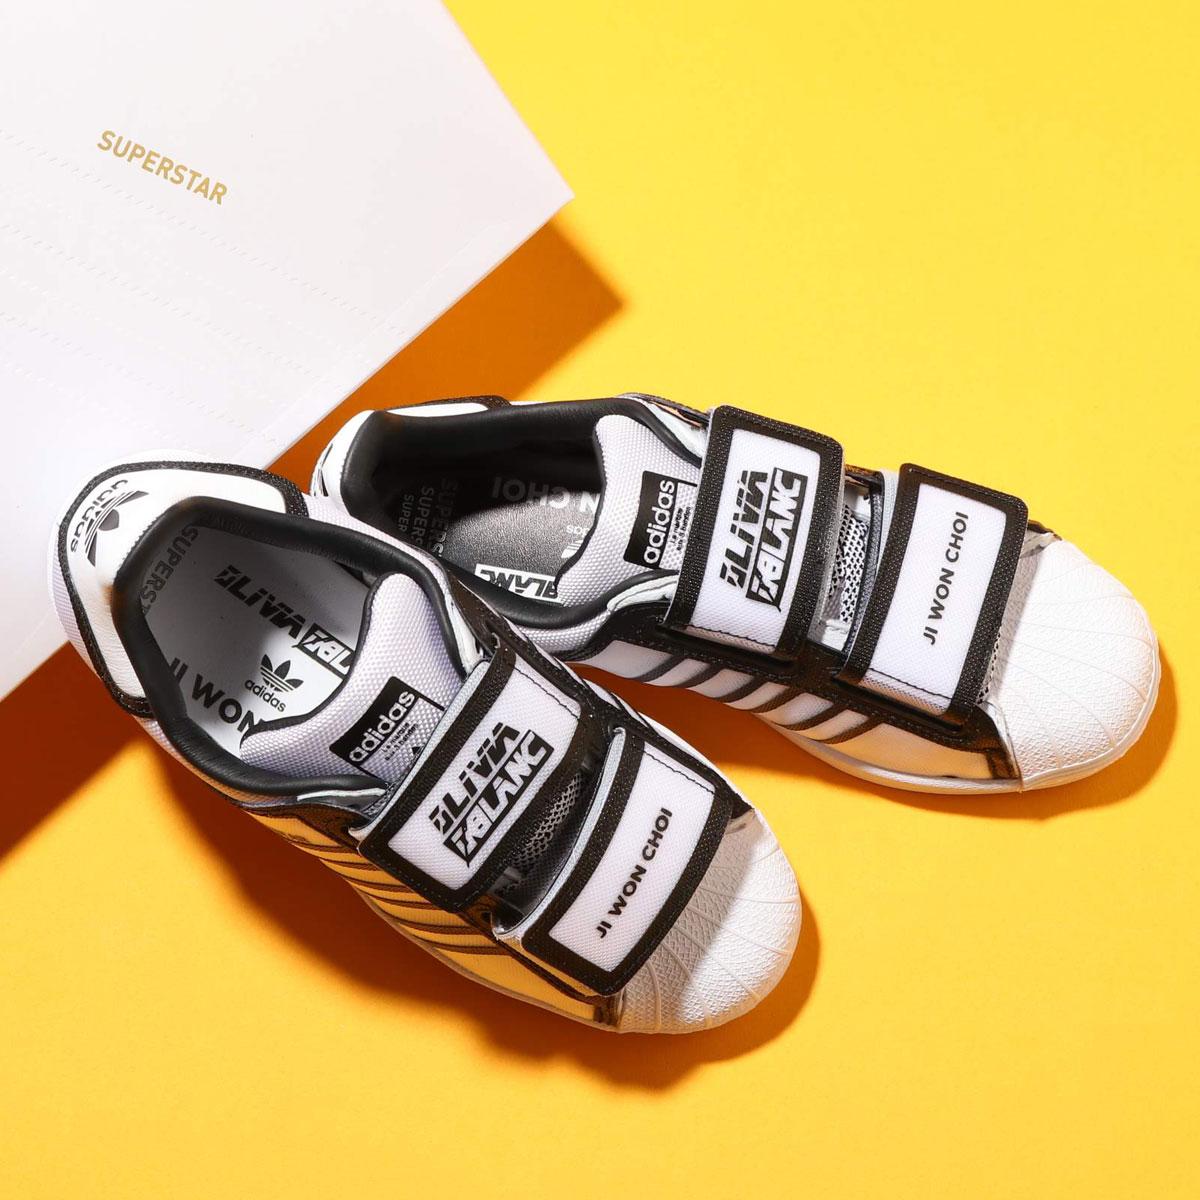 adidas SUPERSTAR W(アディダス スーパースター)FOOTWEAR WHITE/CORE BLACK/SCARLET【メンズ レディース スニーカー】20SS-S